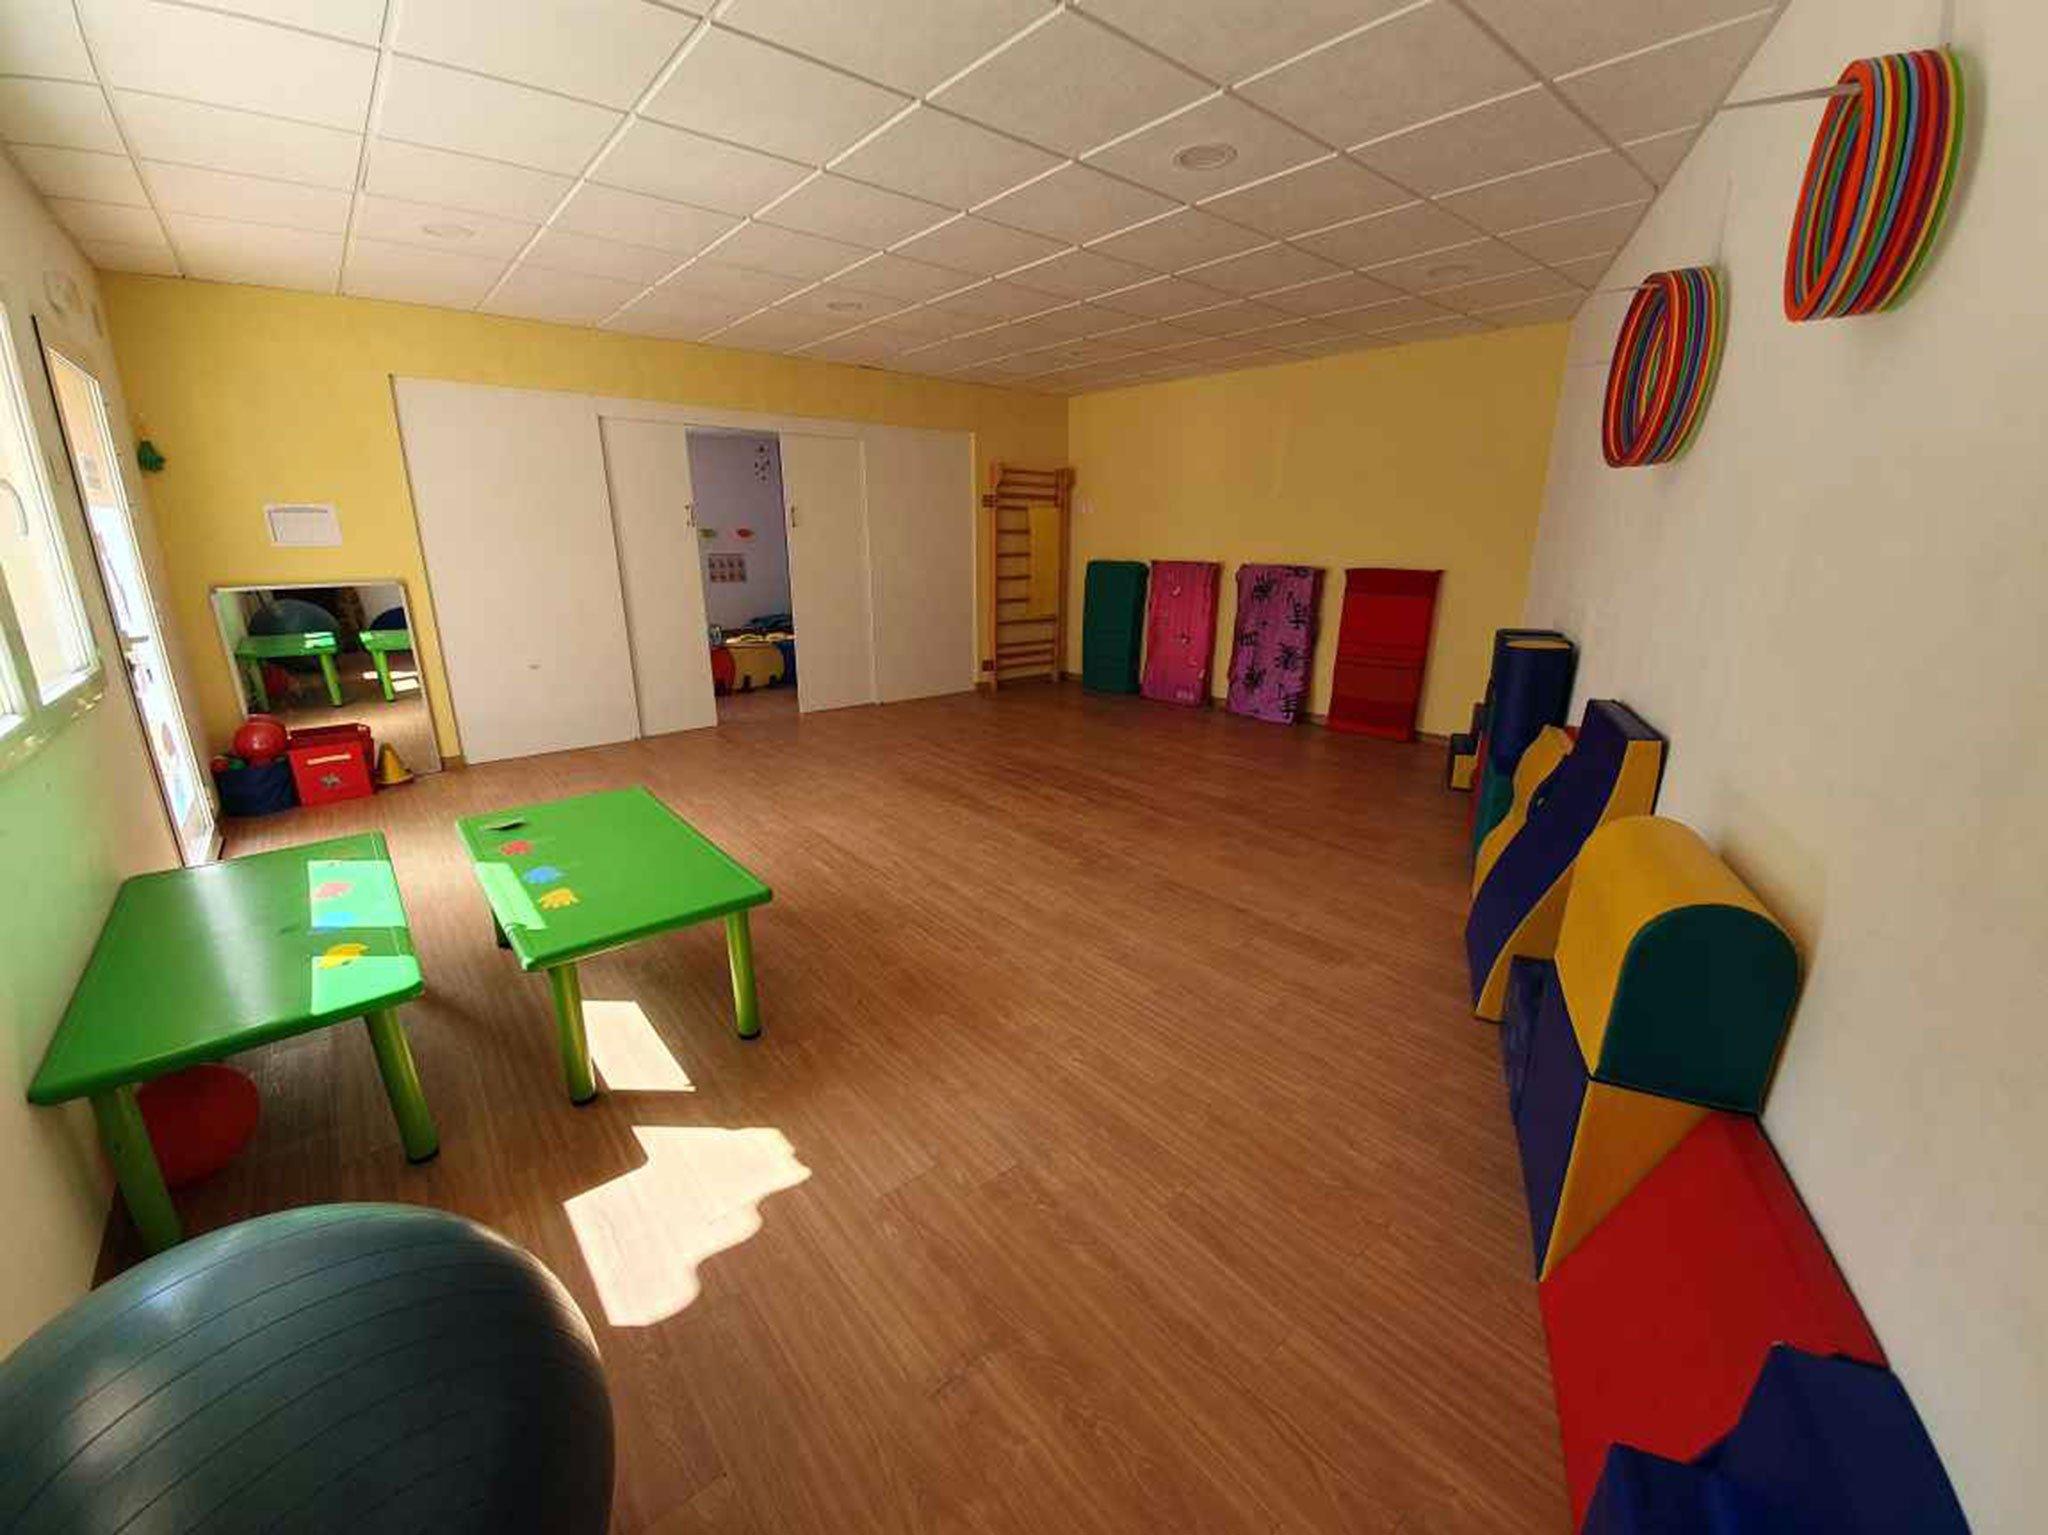 Aula de psicomotricitat - Escoleta El Castellet